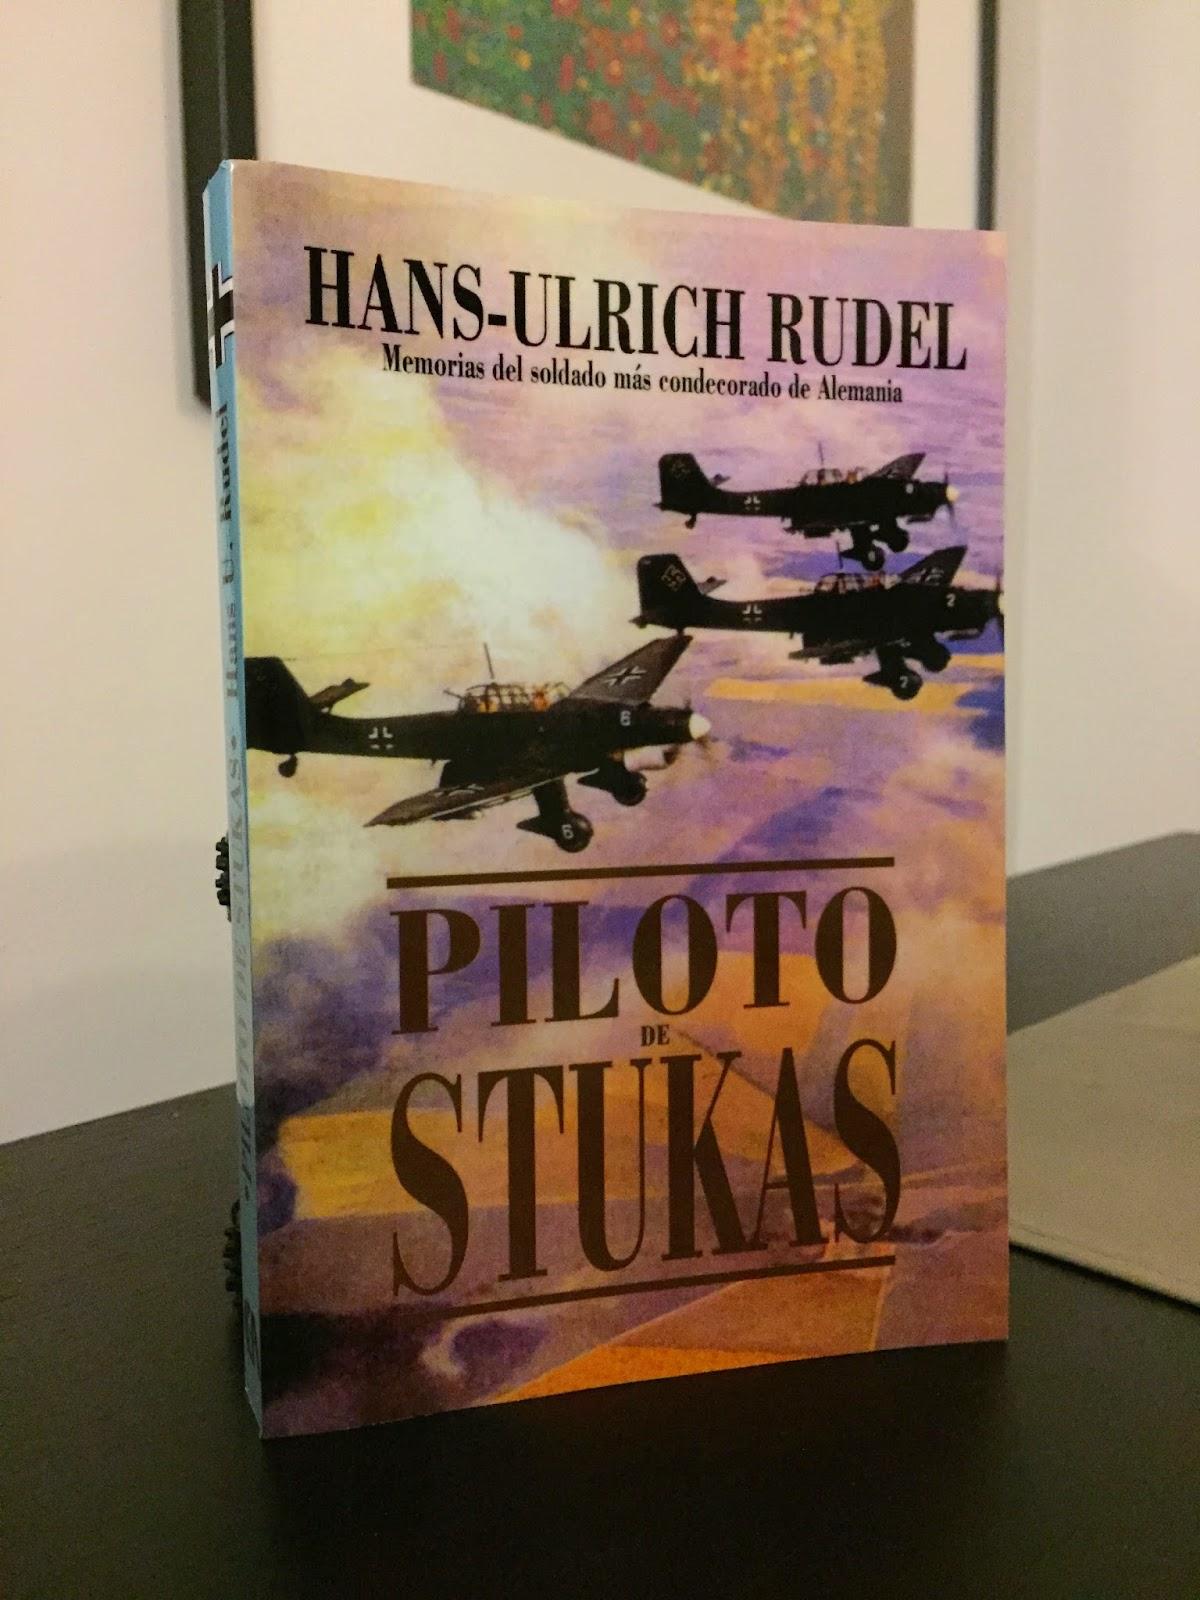 Piloto de Stukas, Segunda Guerra Mundial, Rudel, Libros de guerra